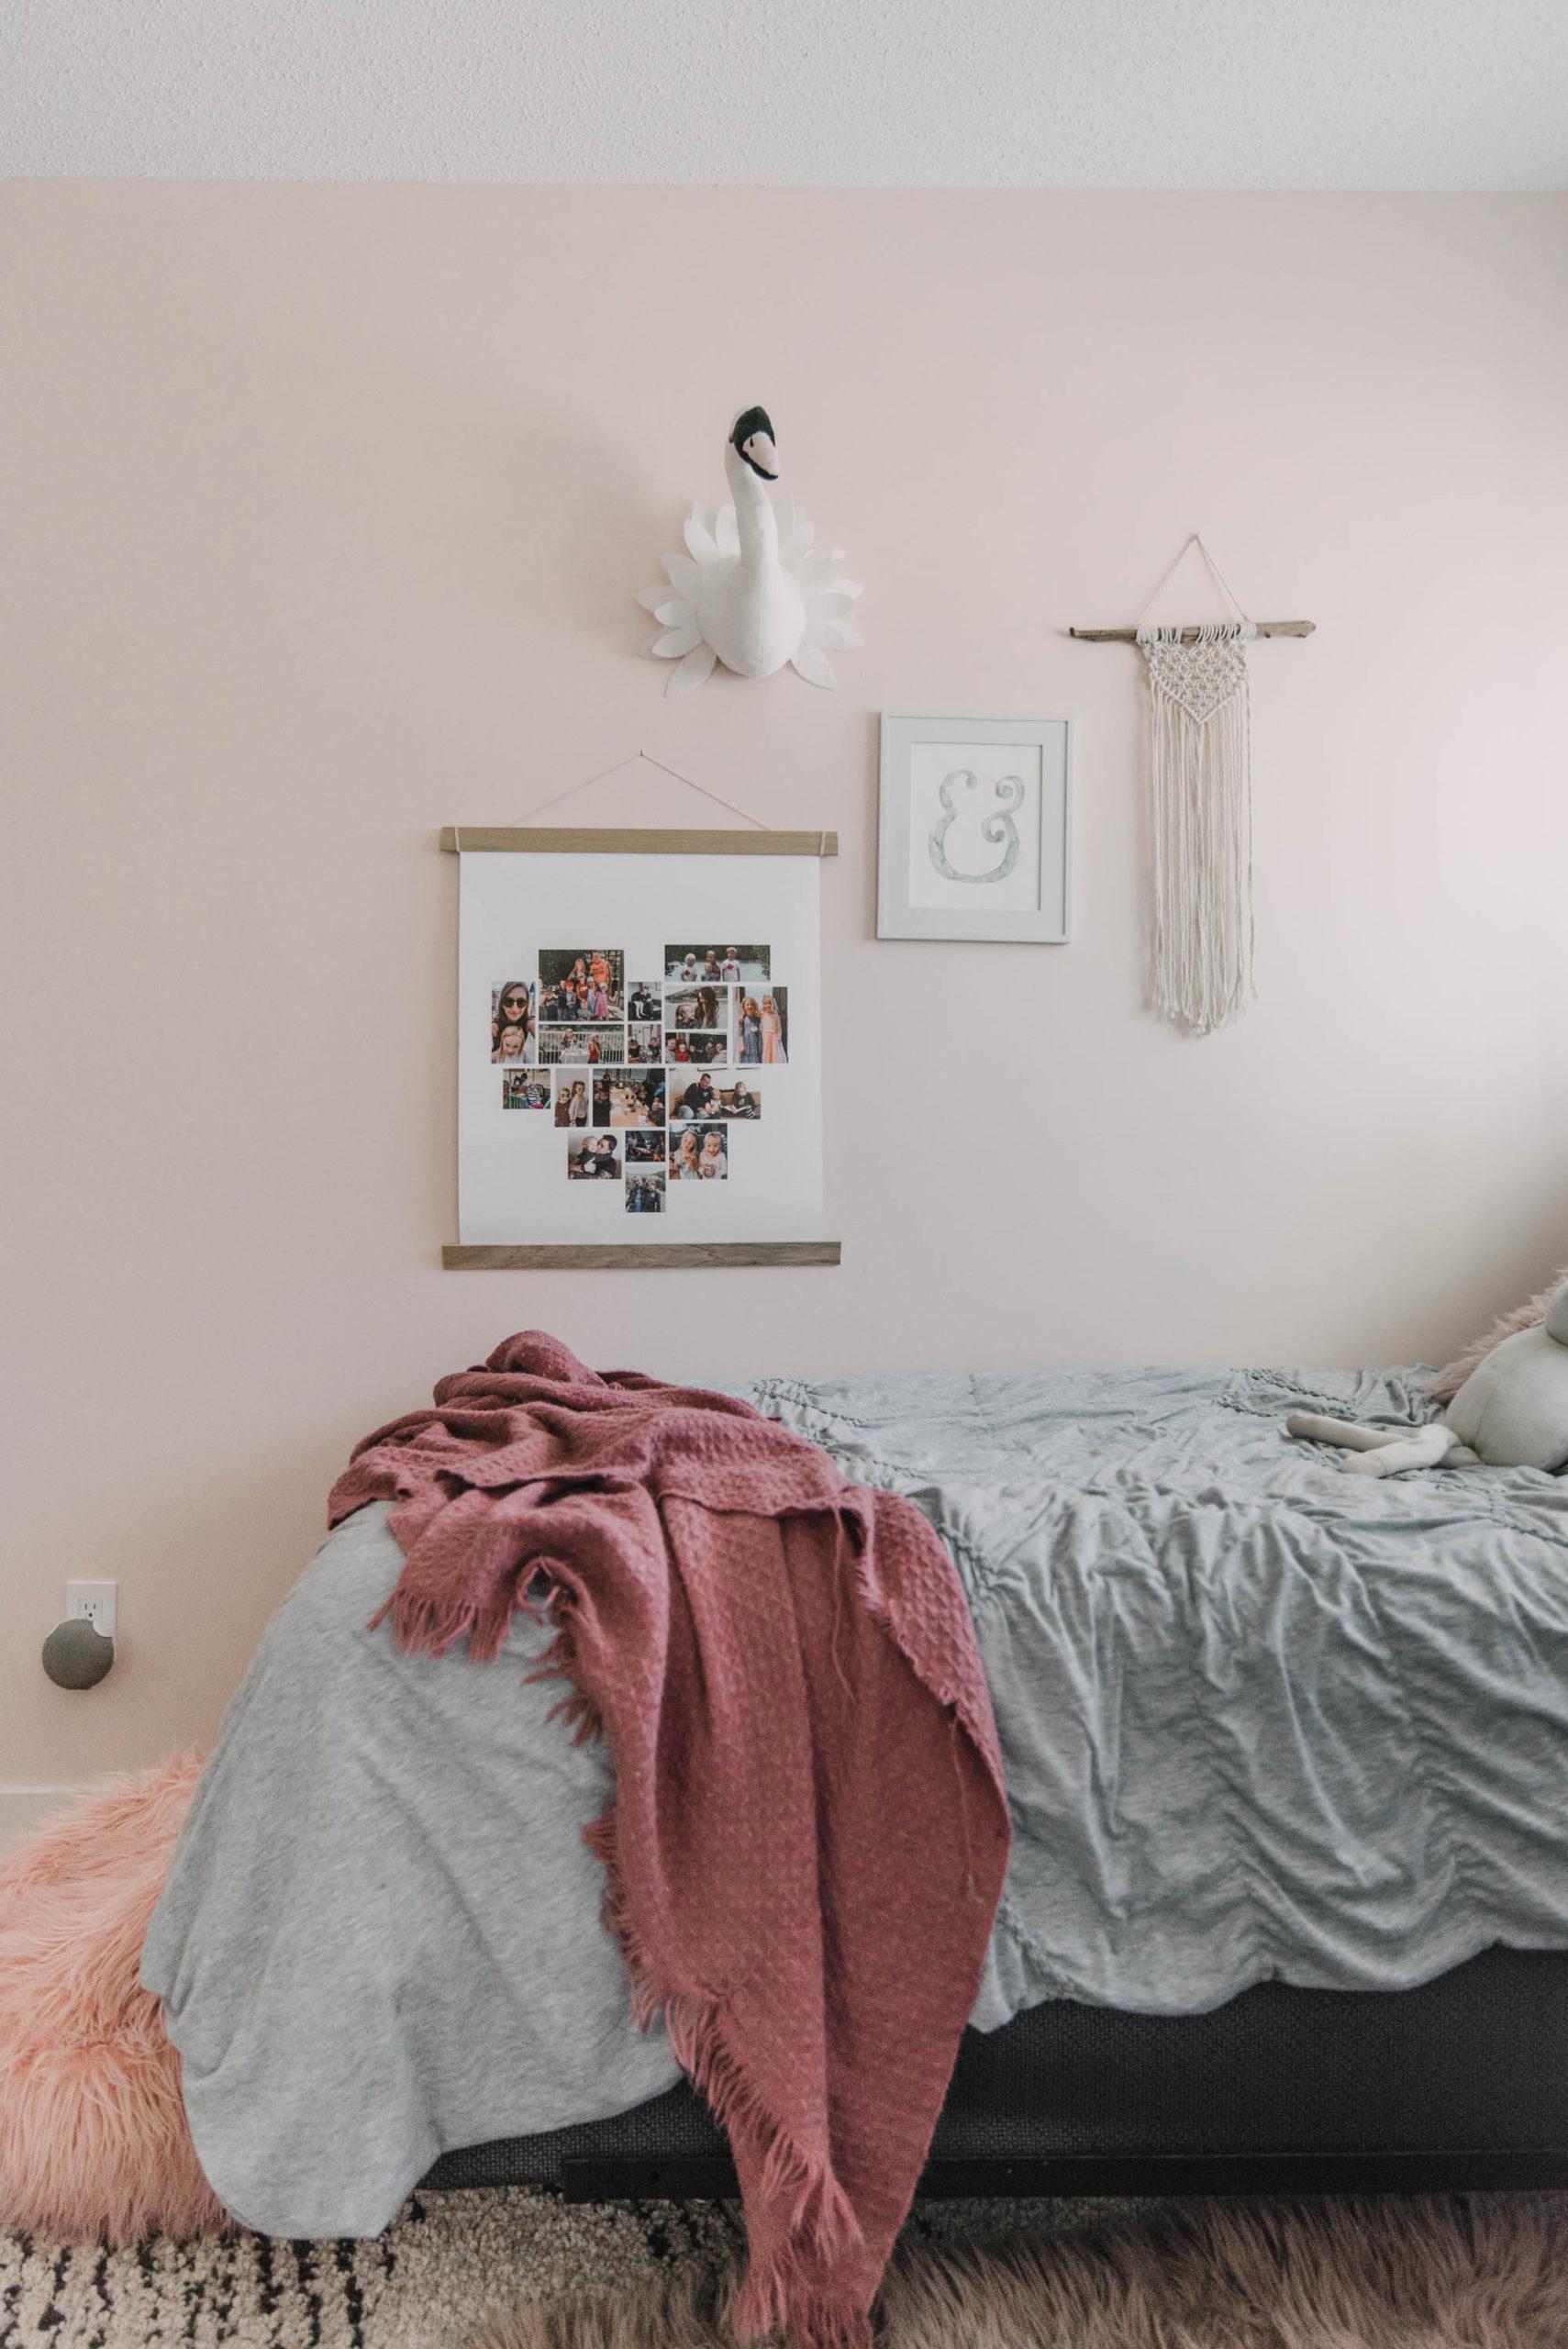 Simple DIY Poster Hanger